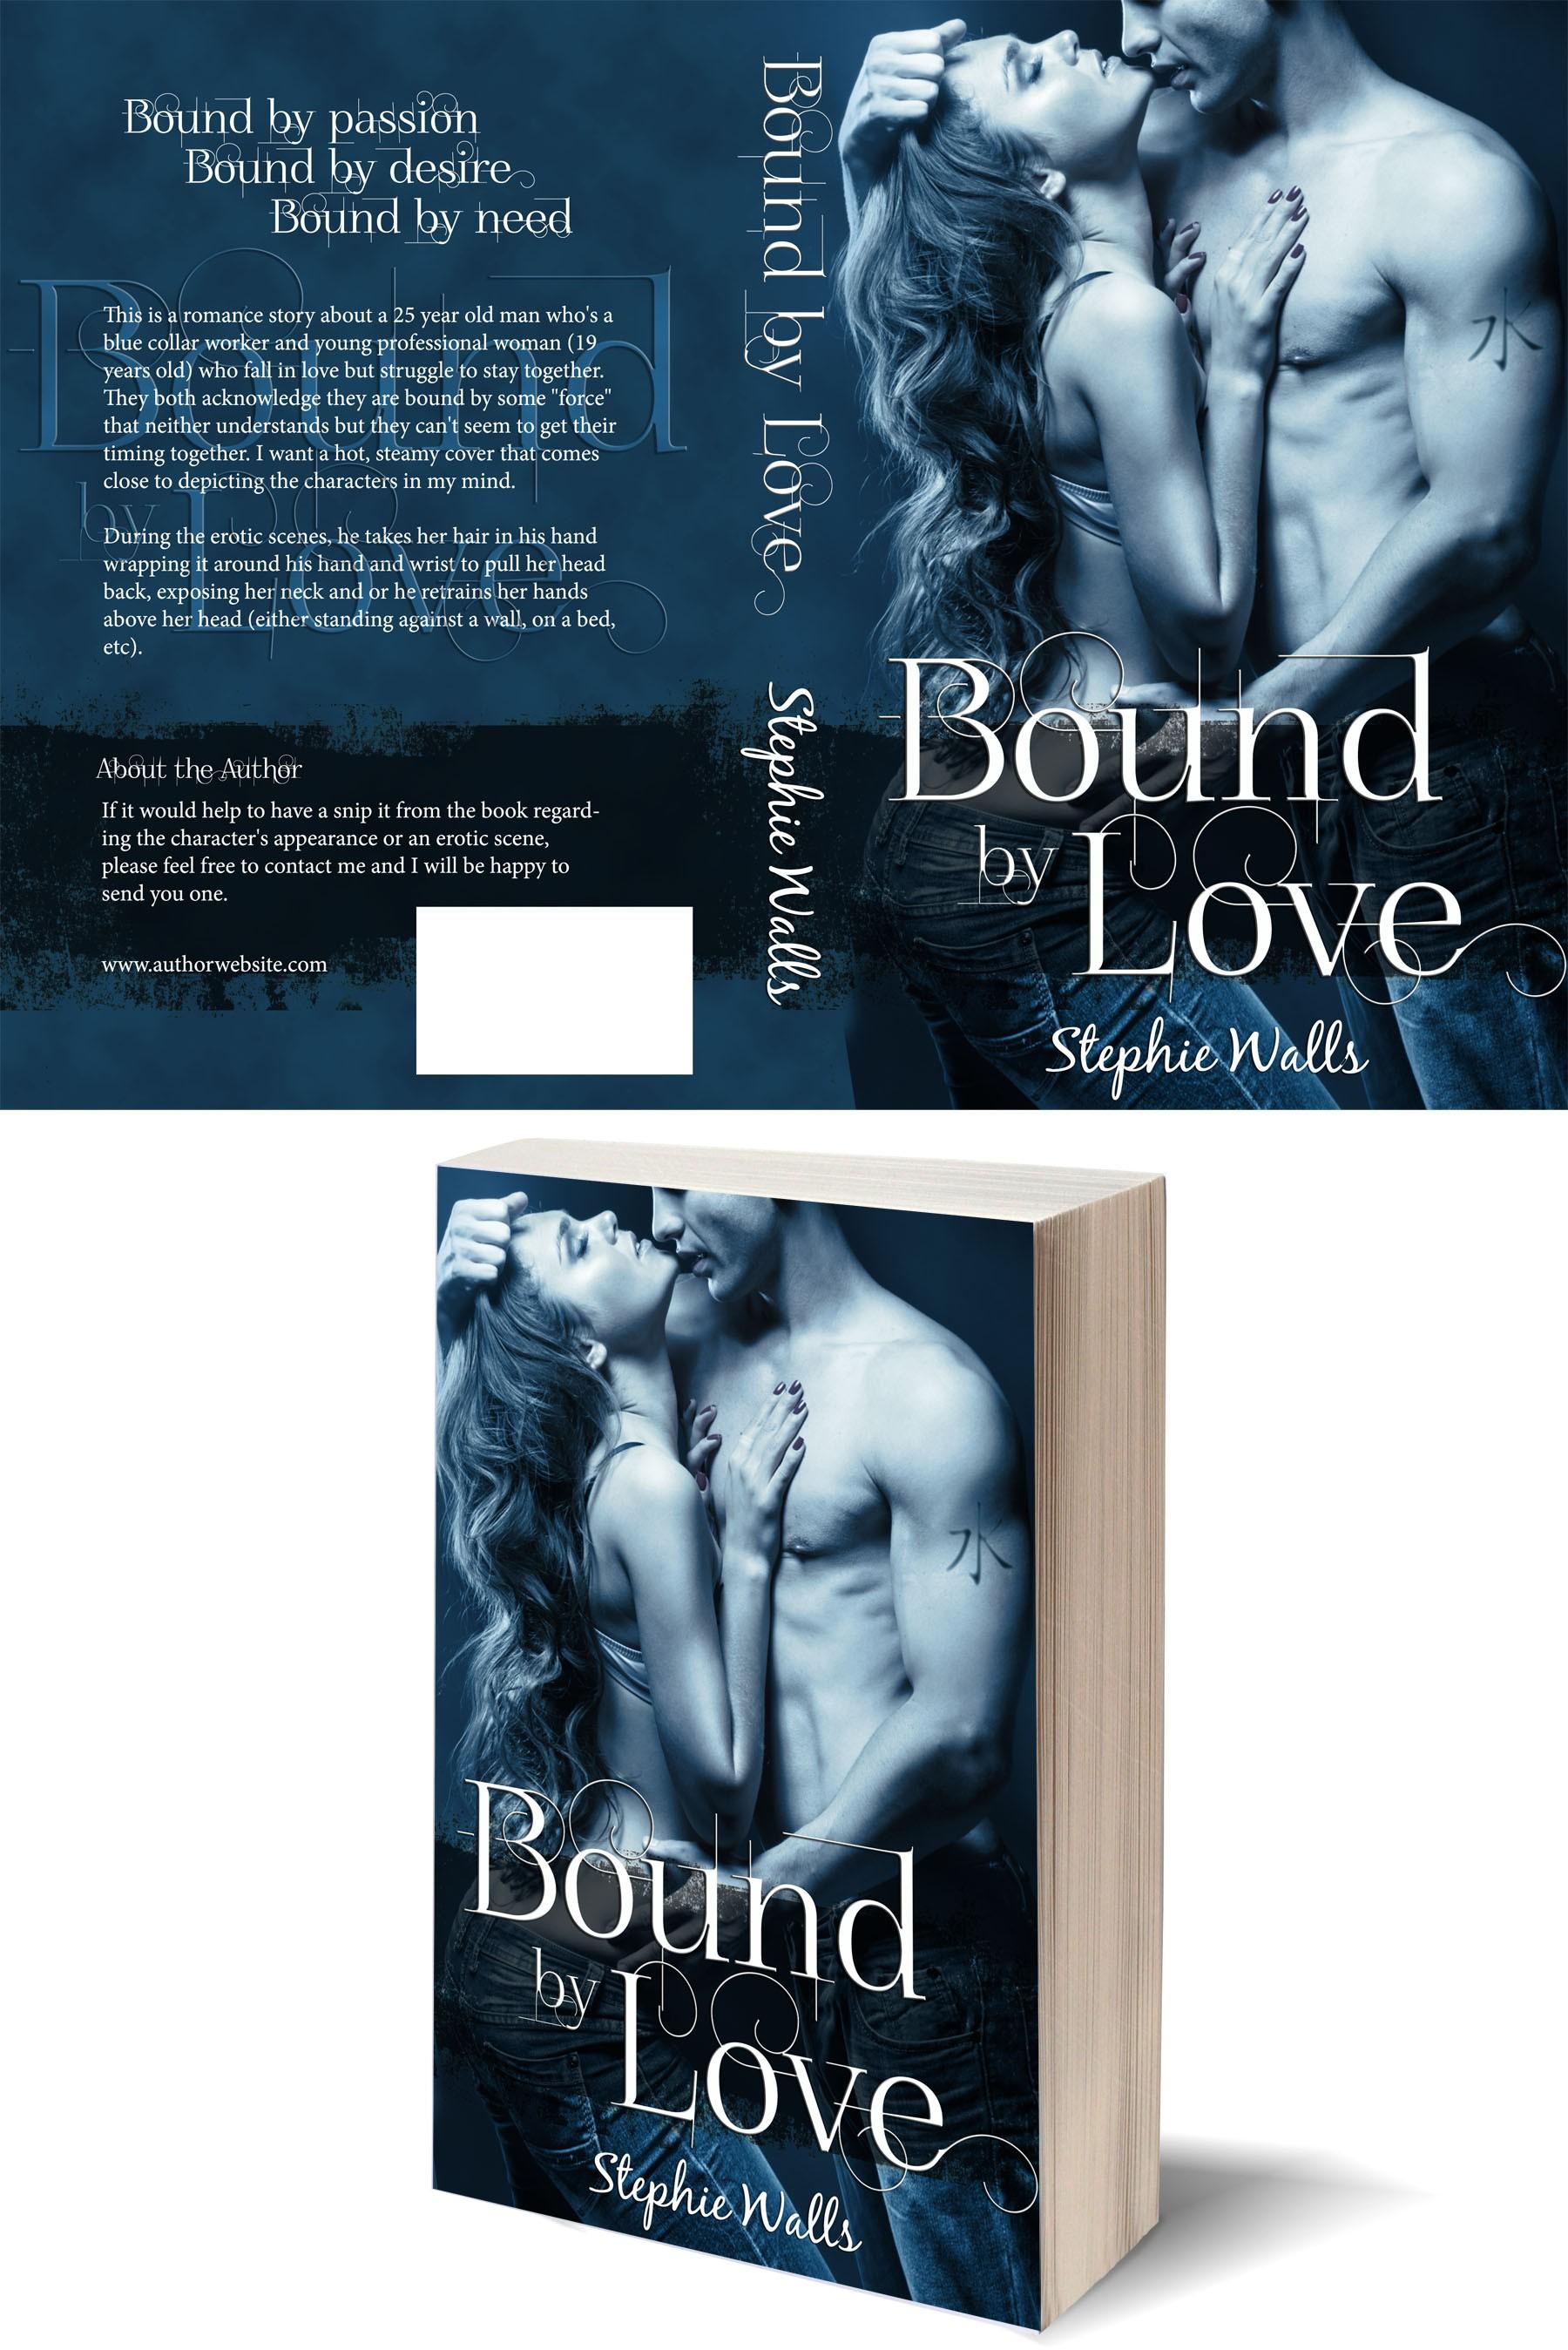 Book Cover Design for Erotic Romance